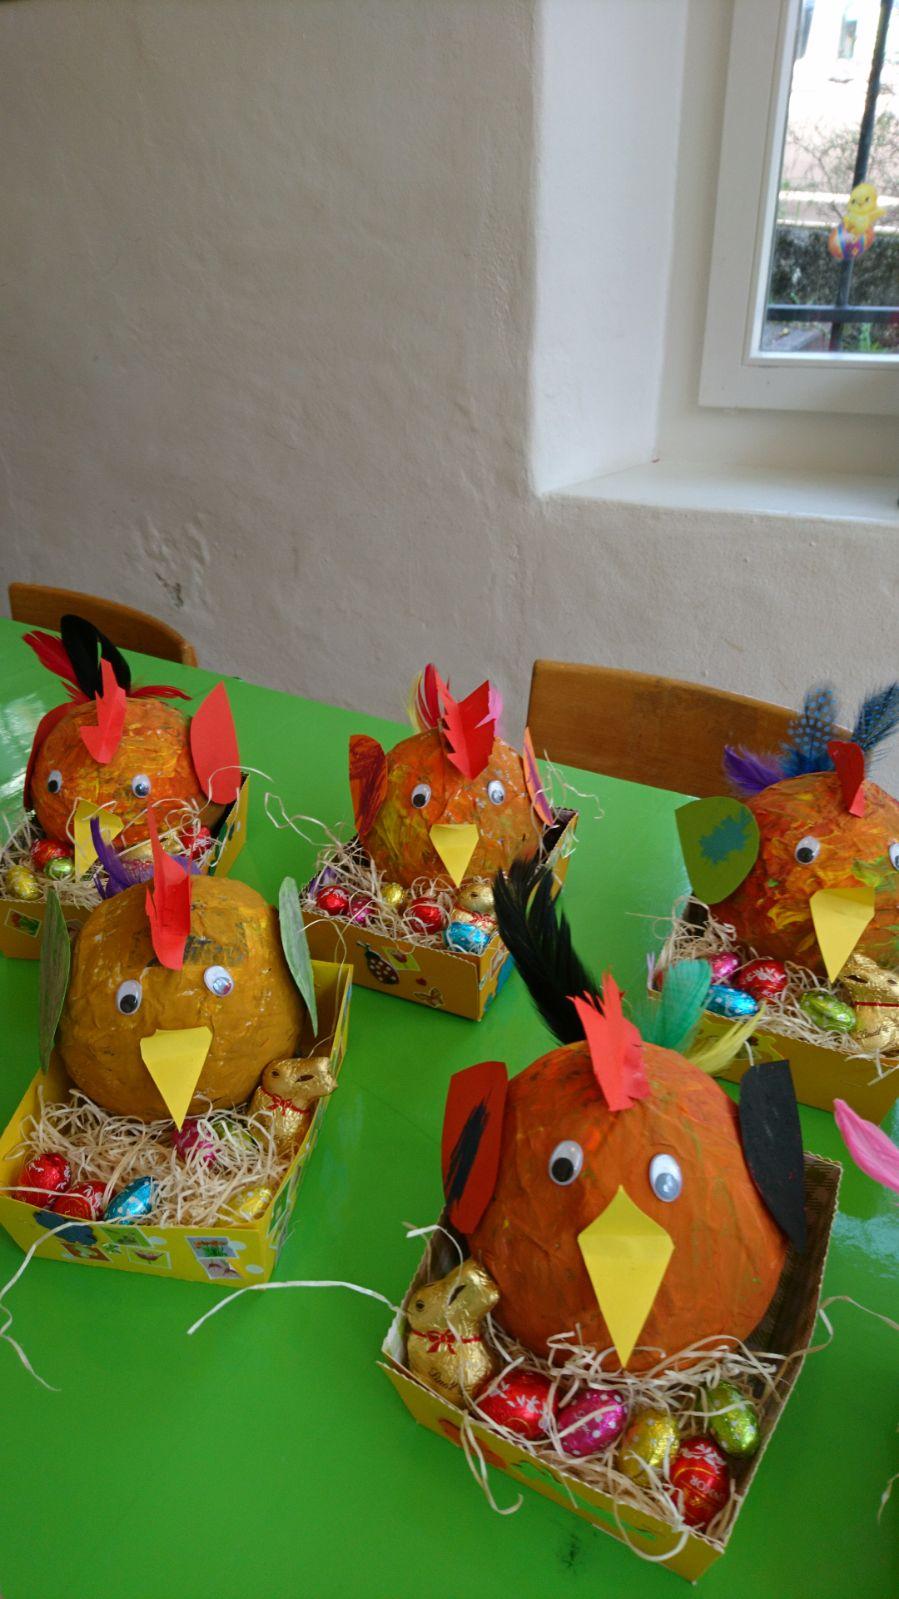 Osterhennen im Osterkörbli ..selbst gekleistert, geschnipselt und bemalt